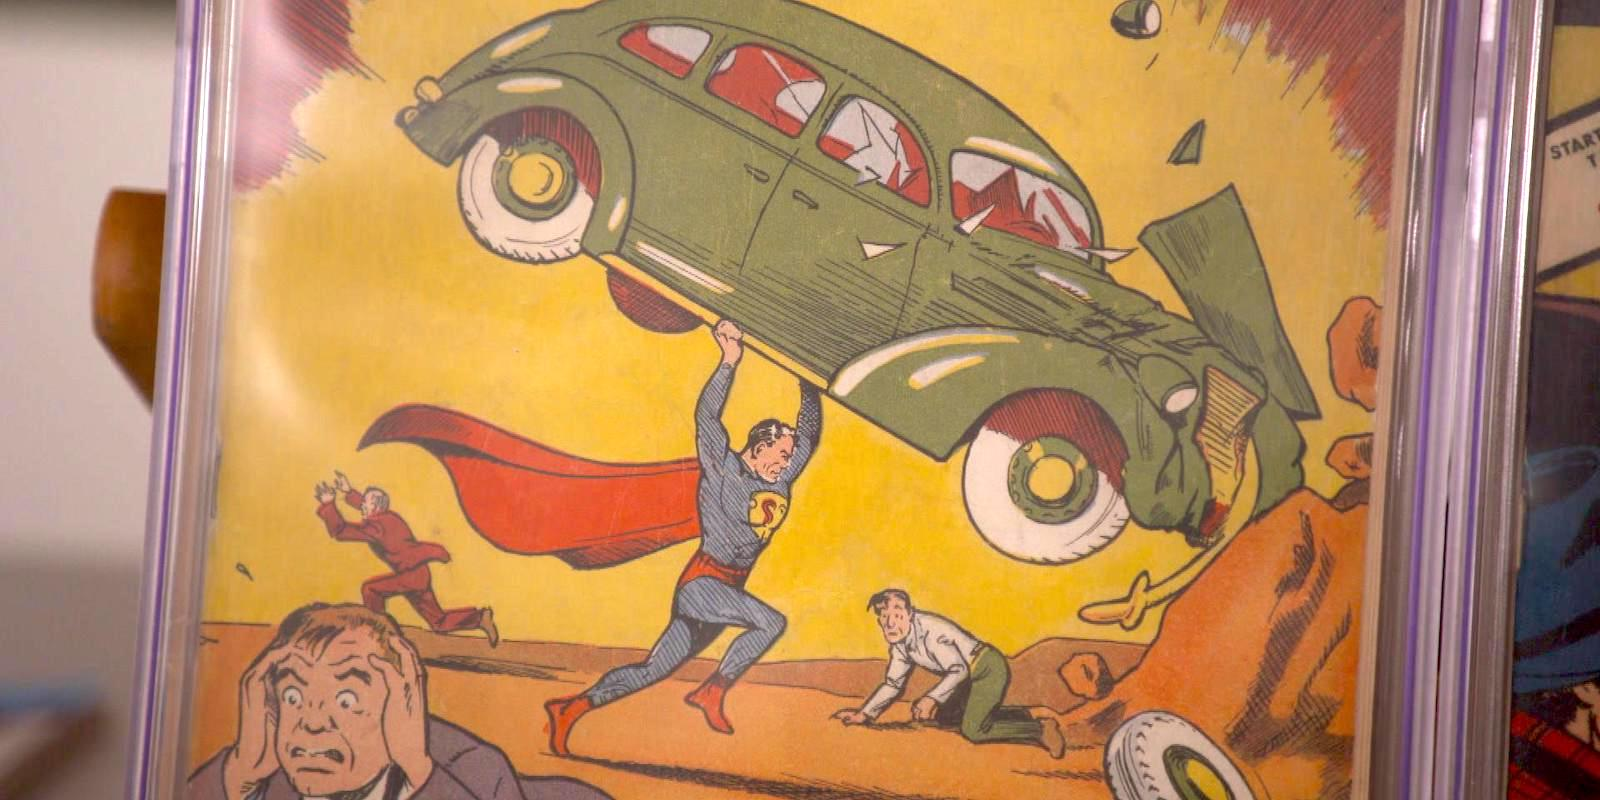 https://www-tc.pbs.org/prod-media/antiques-roadshow/article/images/Action_Comic_Superman_ECU-lede.jpg